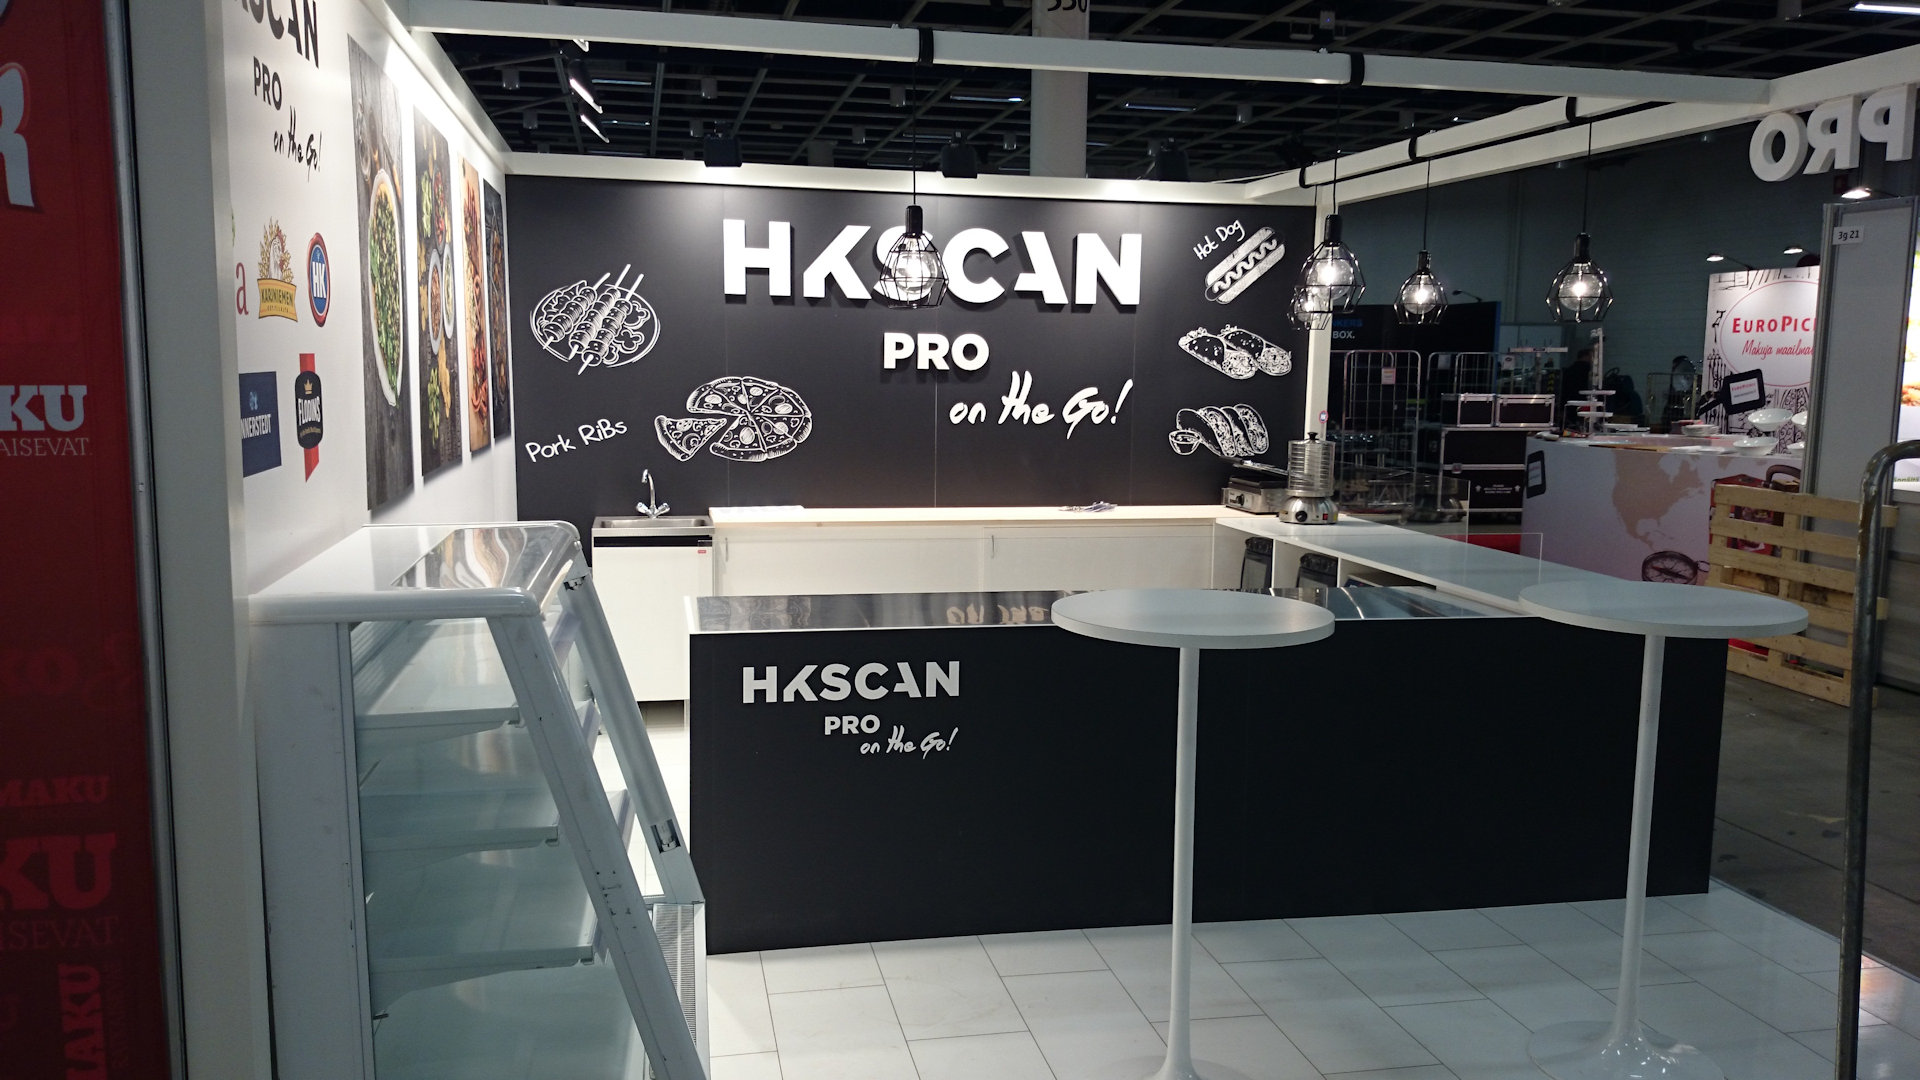 HK_Scan_Helsingi_2016_4